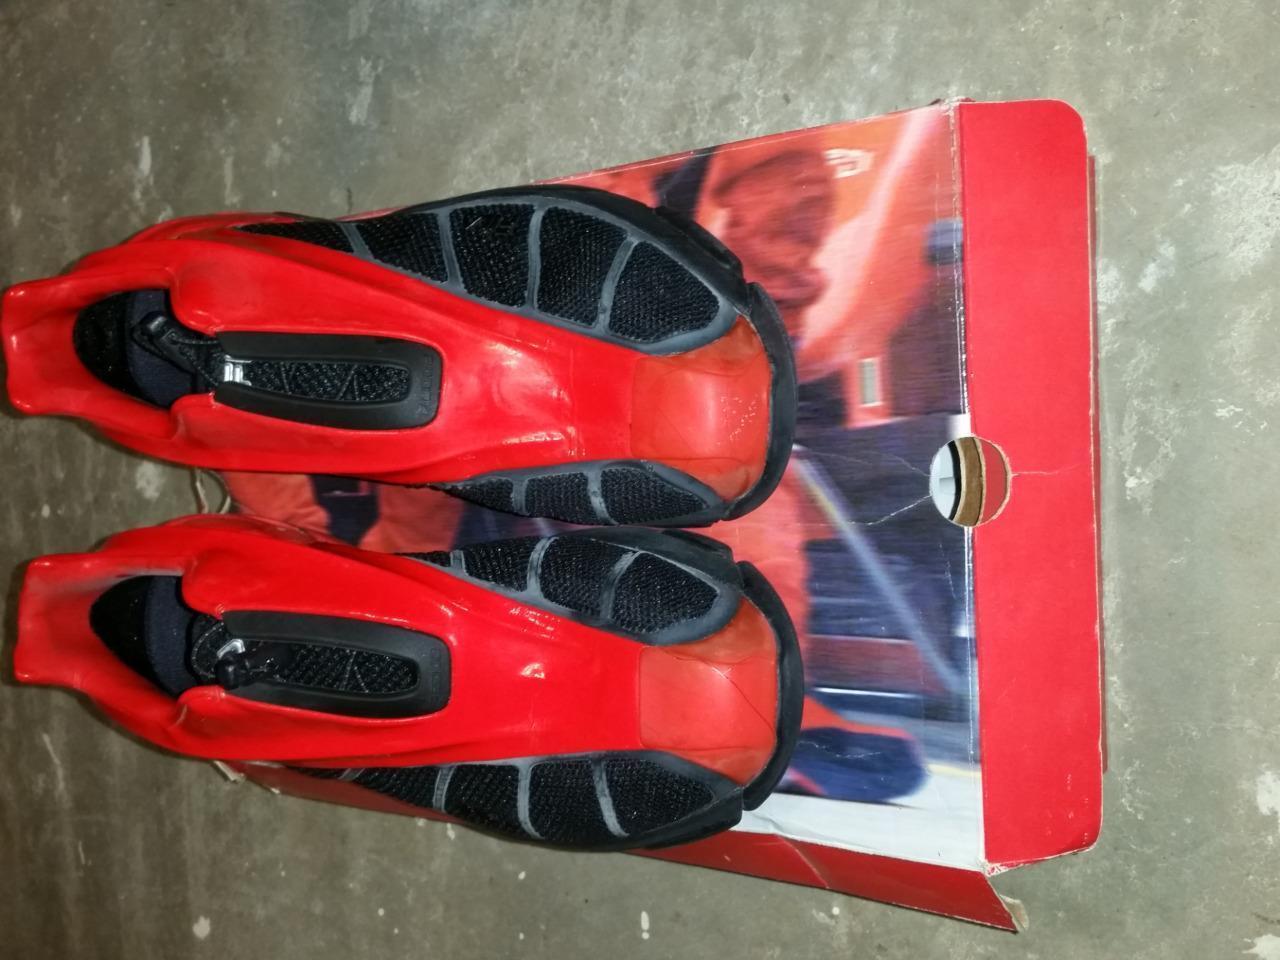 Fila FERRARI M's F2002 Syn Mesh red SQDRA-Blk Red US 11 Used with Orig Box